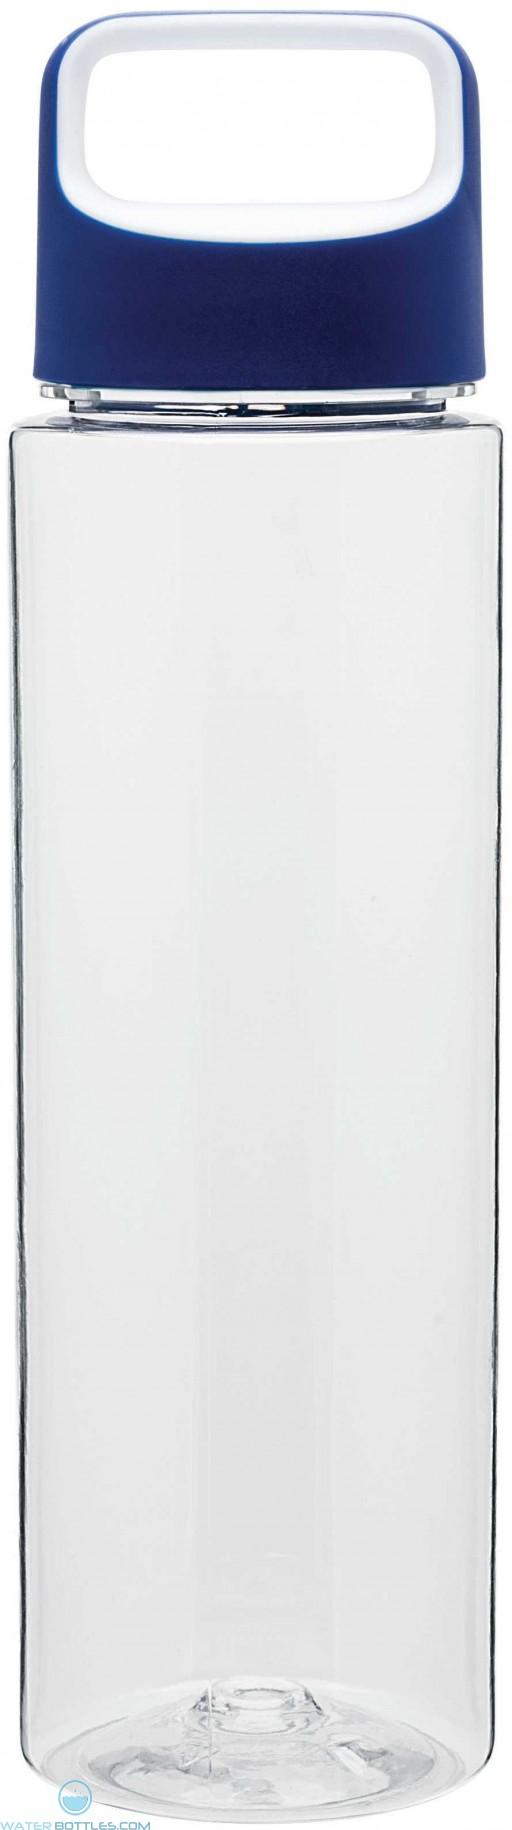 H2Go Elevate Copolyester Water Bottles   27 oz - Blue